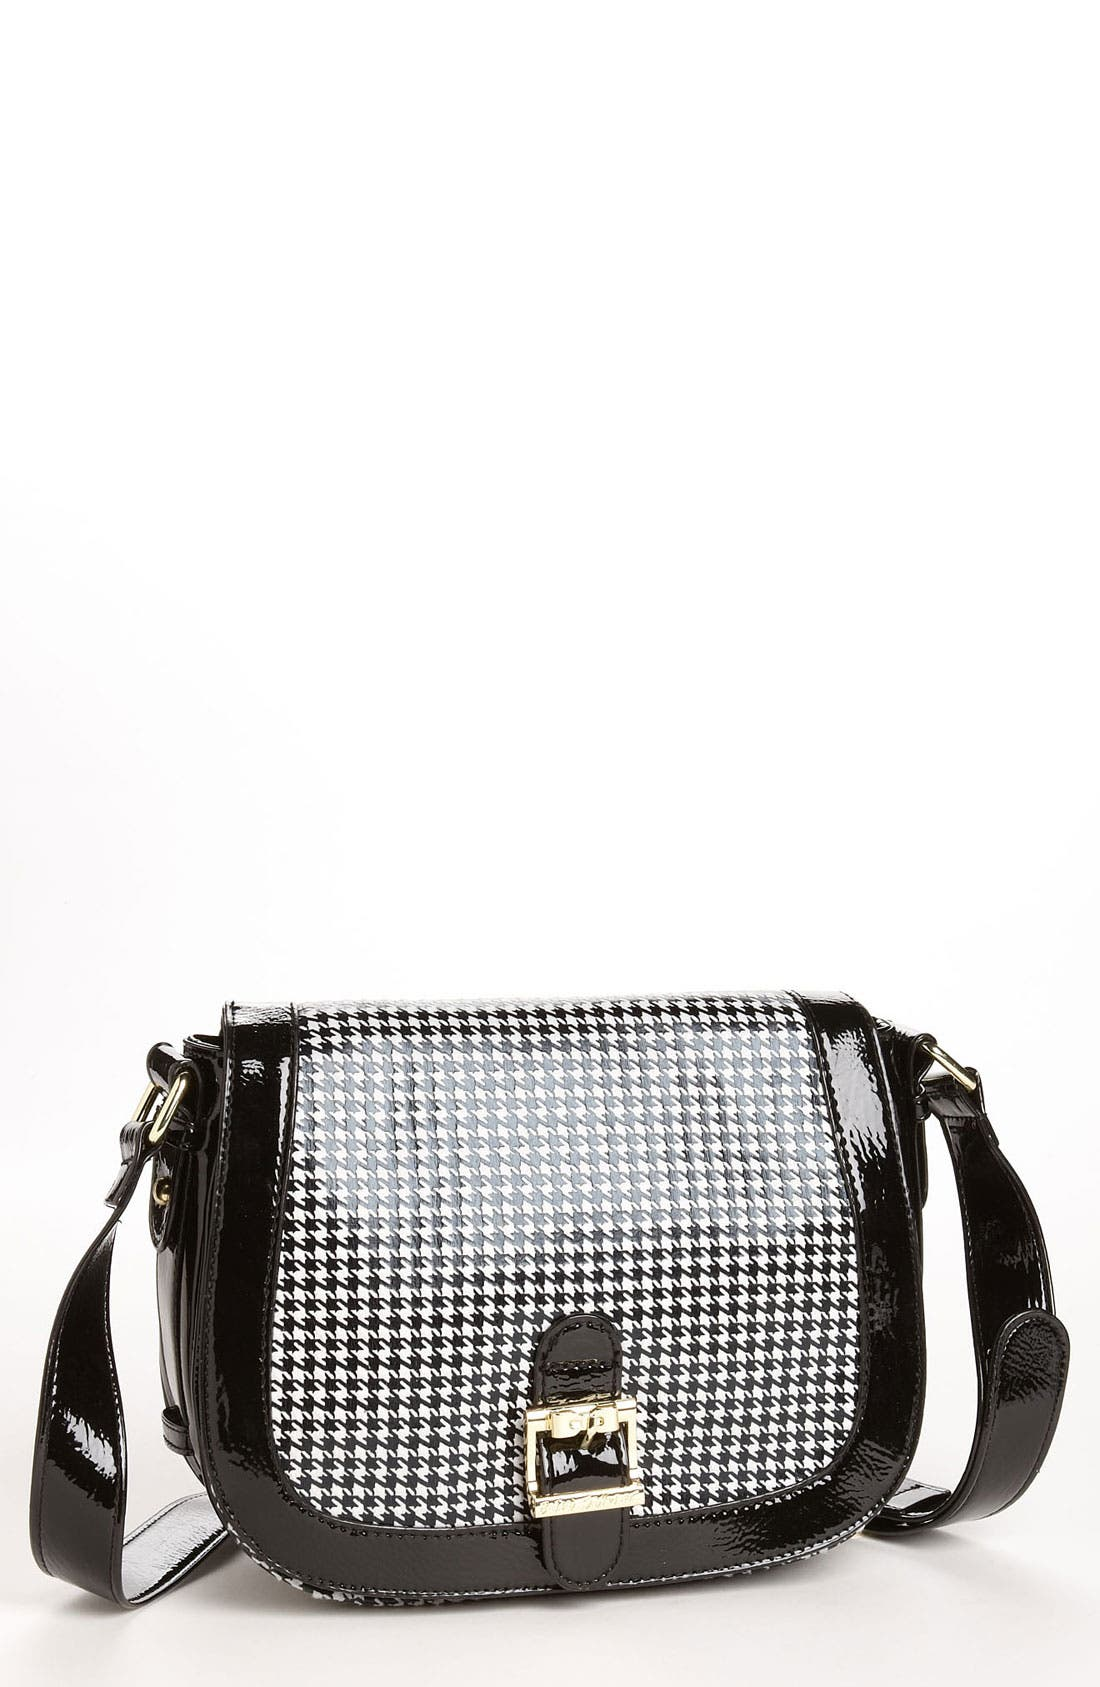 Alternate Image 1 Selected - Betsey Johnson Houndstooth Crossbody Bag